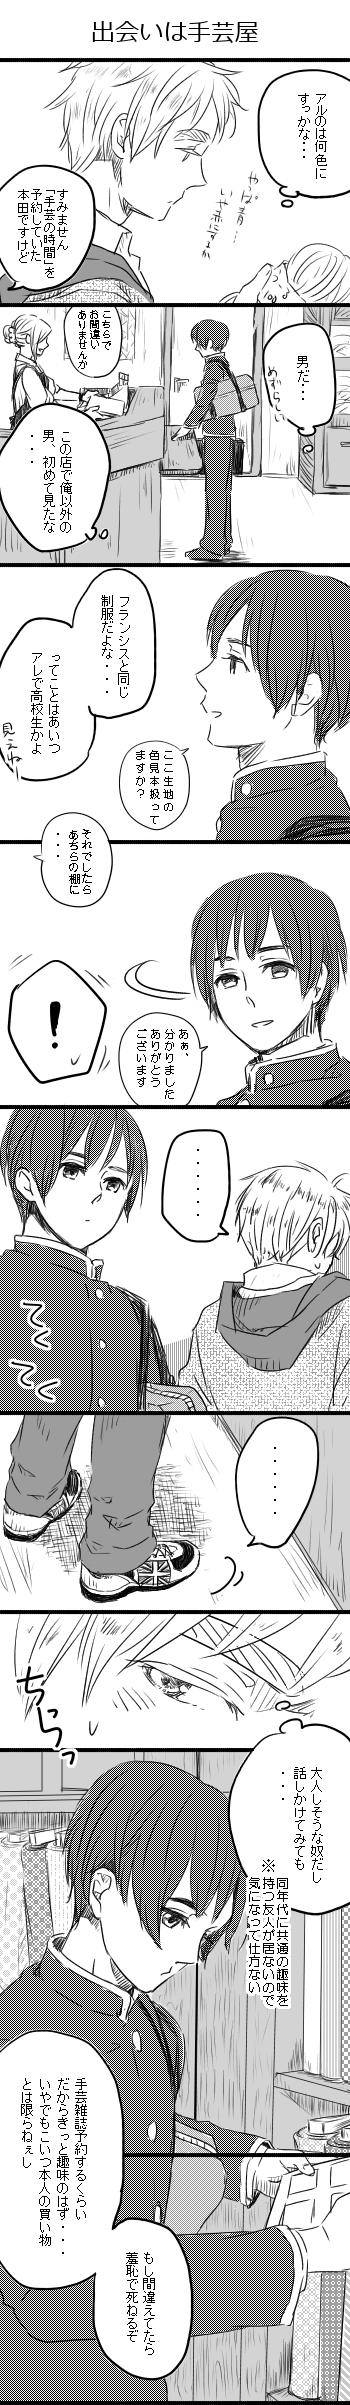 S学パロ_出会い1